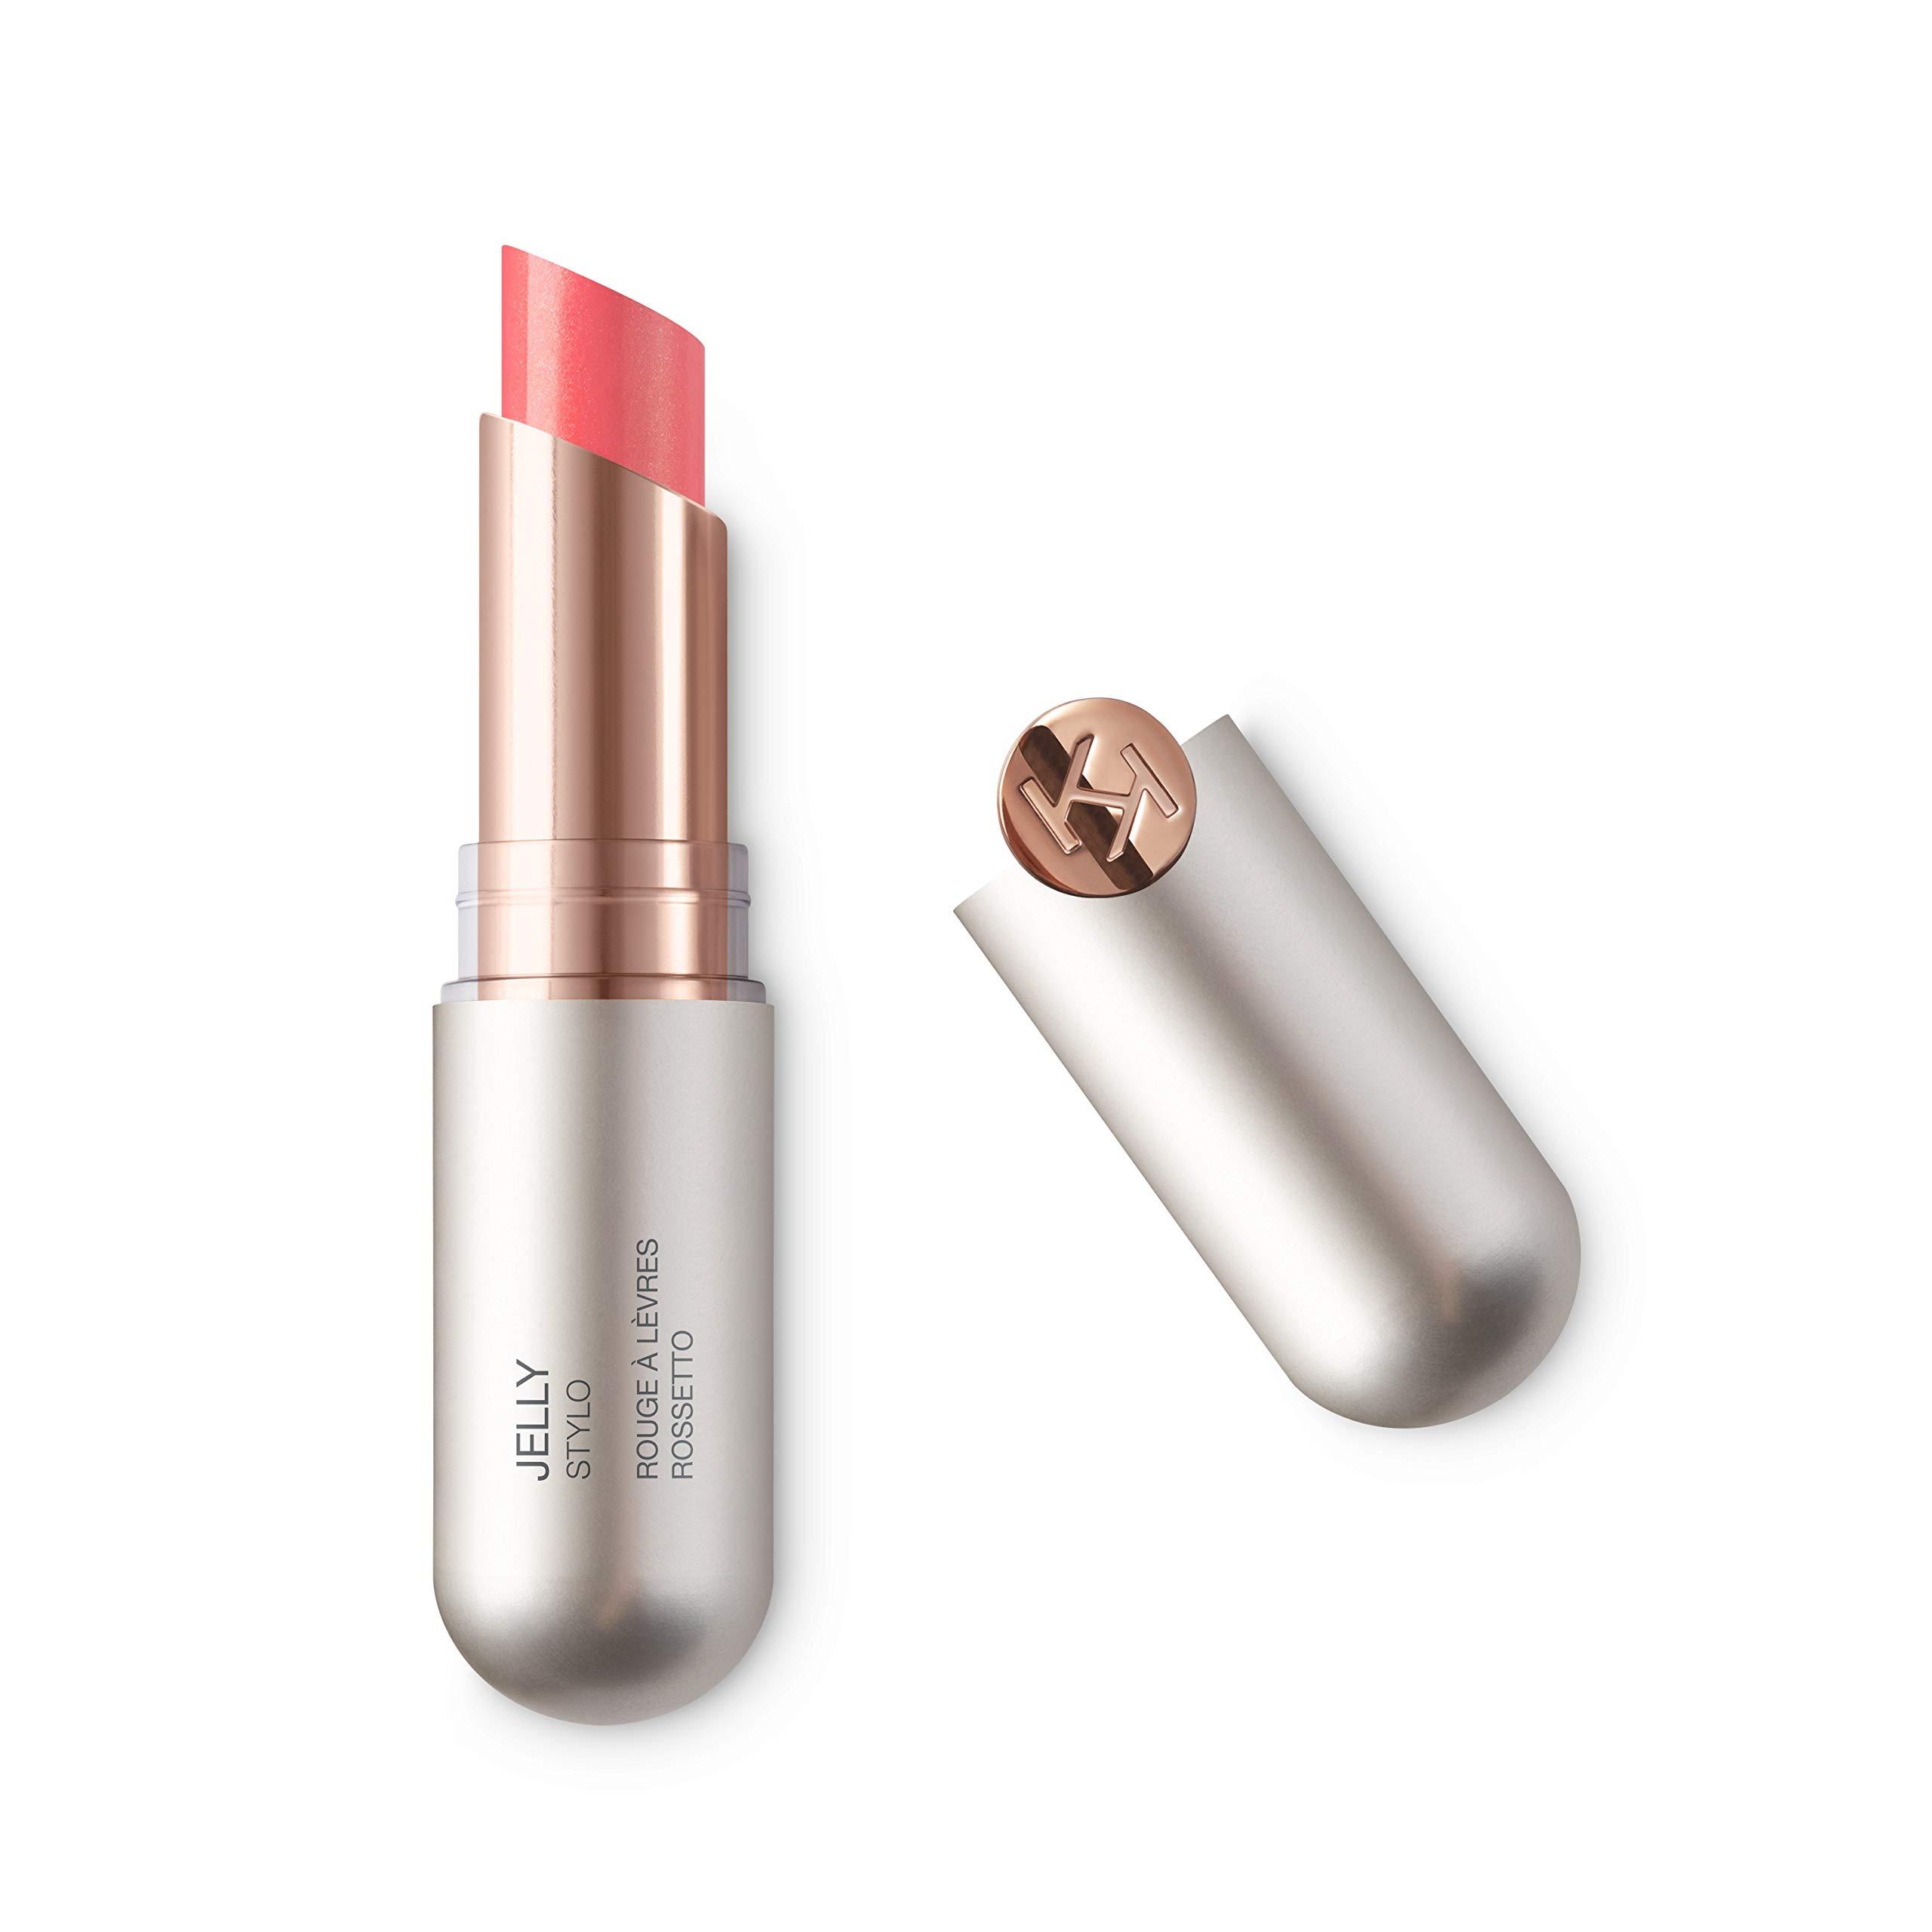 KIKO MILANO - Jelly Stylo Lipstick Wet look finish glossy lipstick. color Hibiscus 507